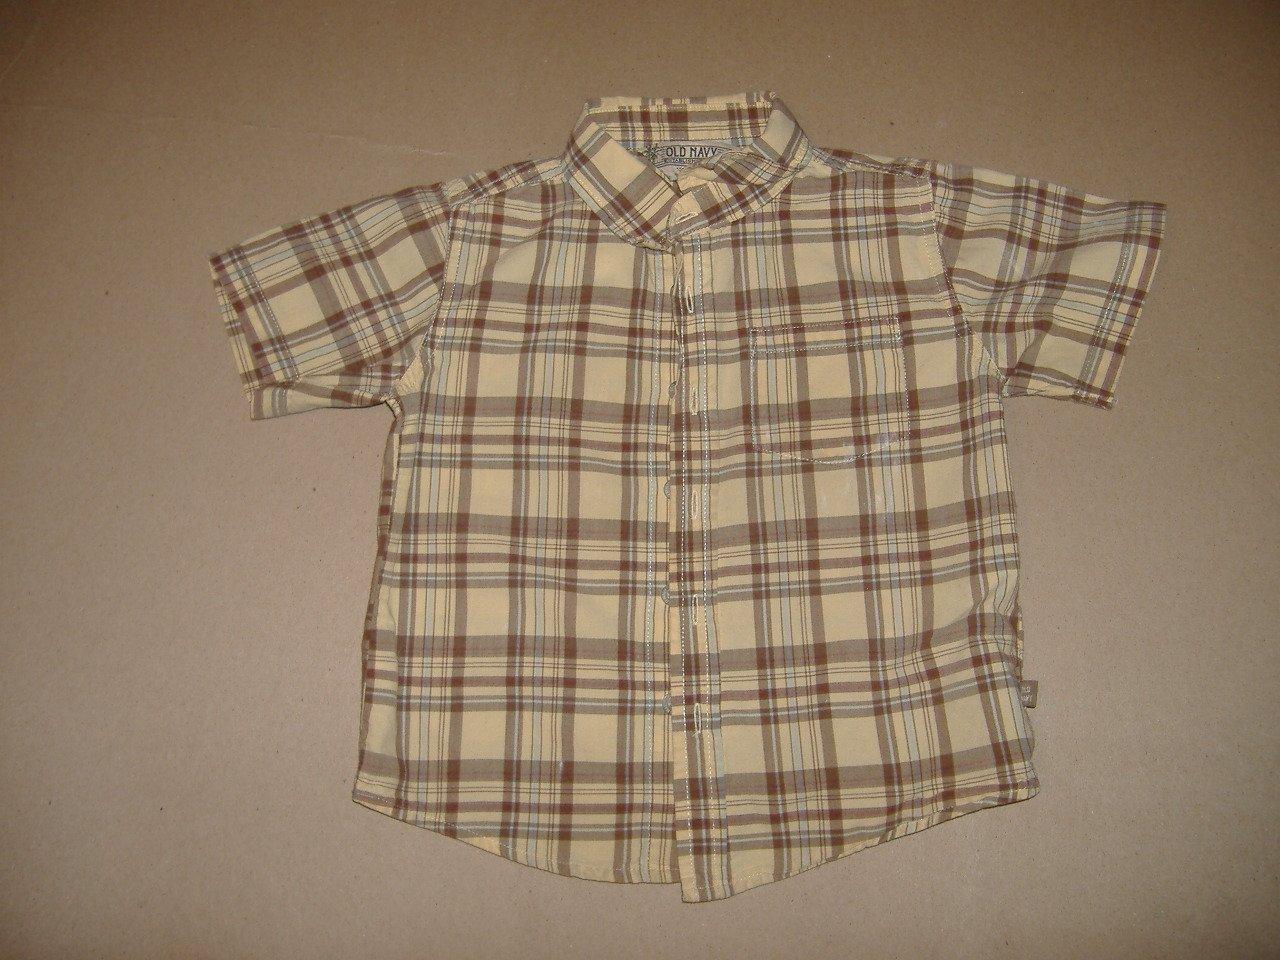 Old Navy Boy's Short Sleeve Shirt   Size 3T